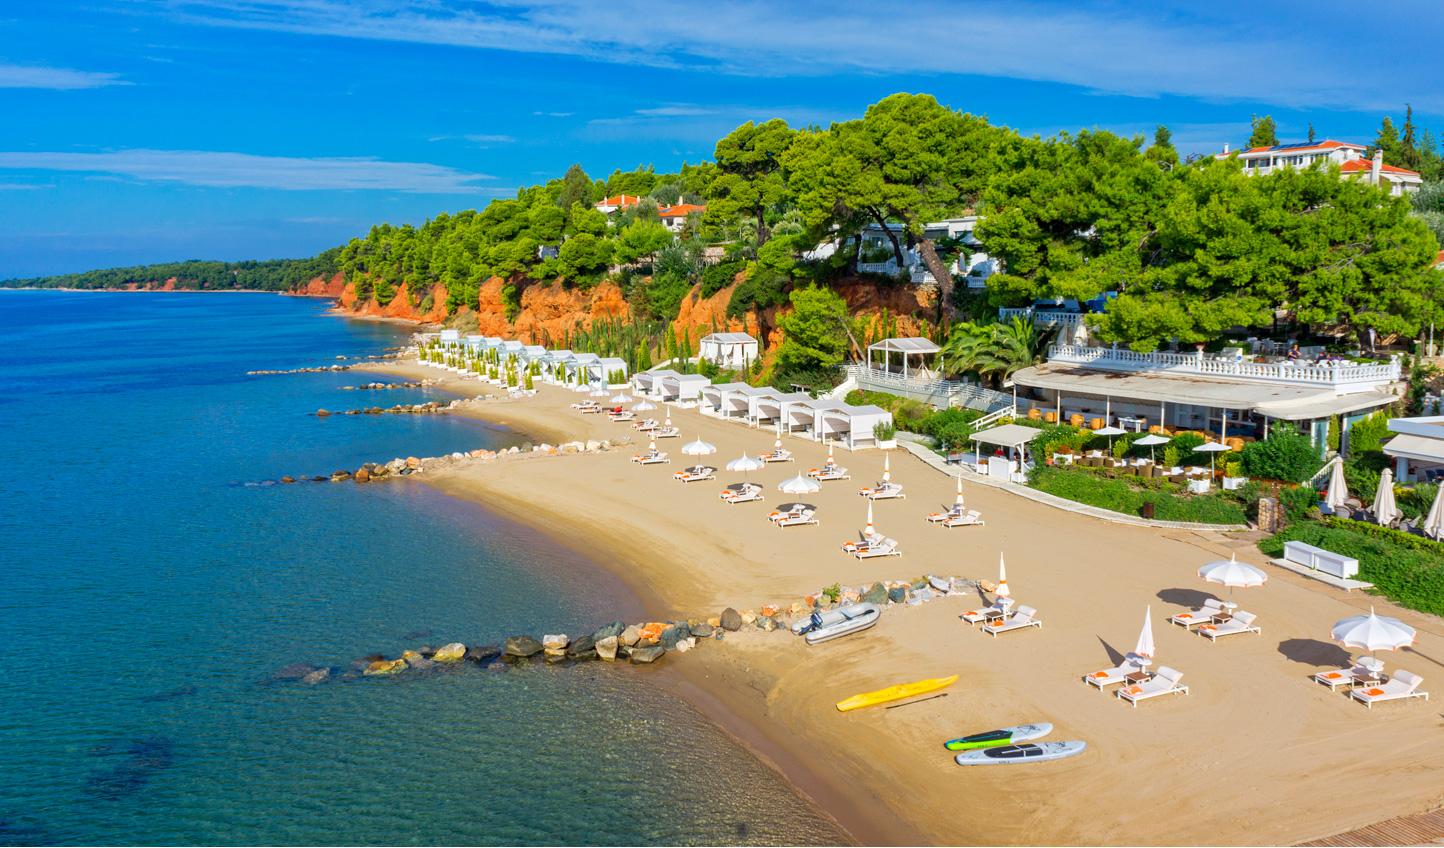 Make the most of Danai Resort's beautiful private beach